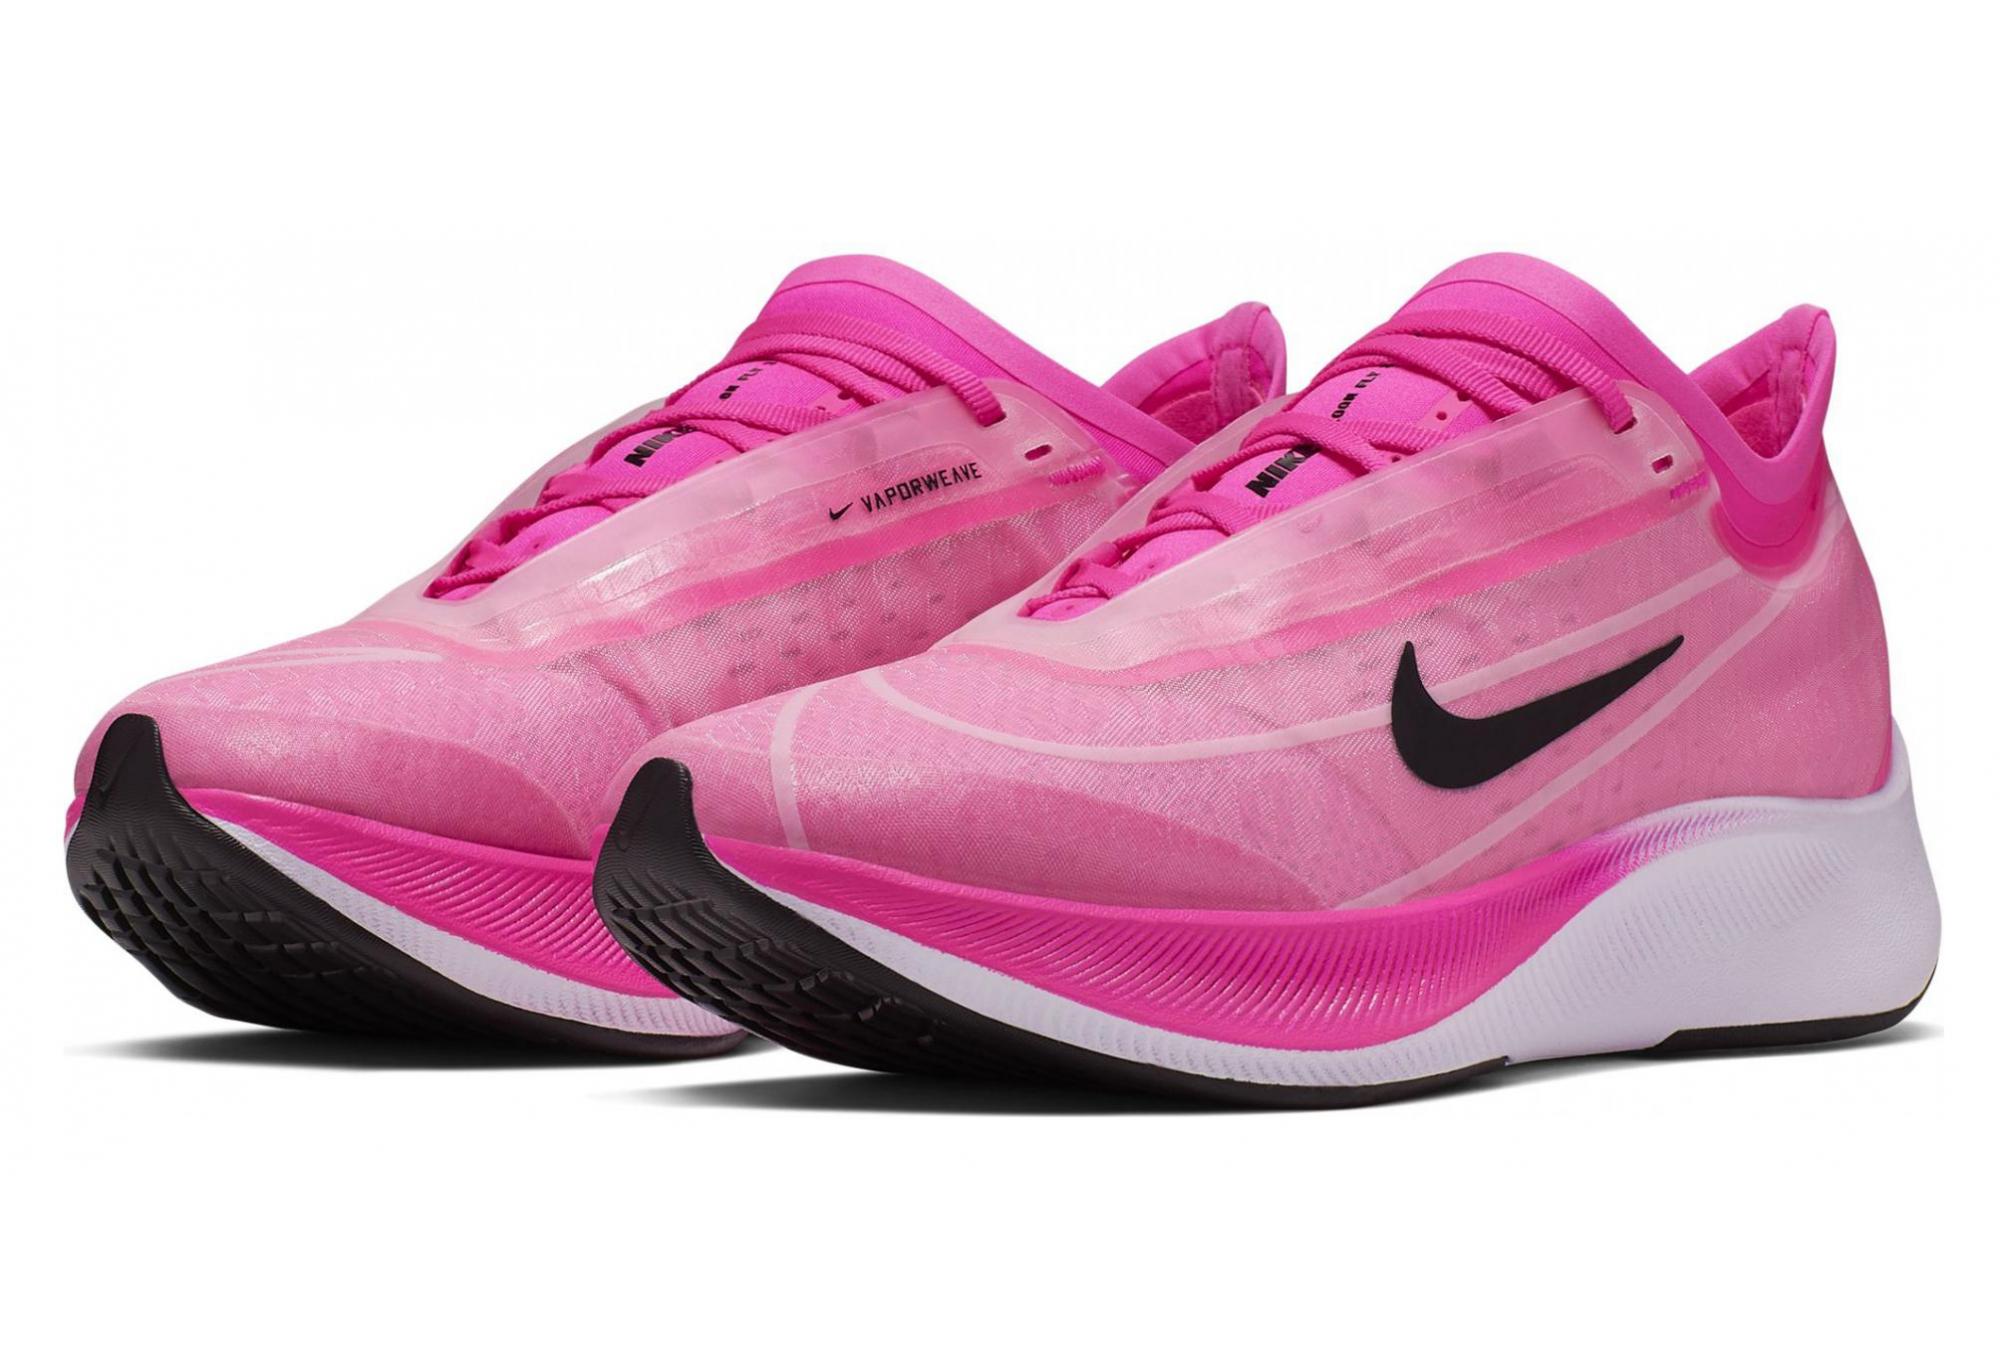 Nike Zoom Fly 3 Pink Black Women